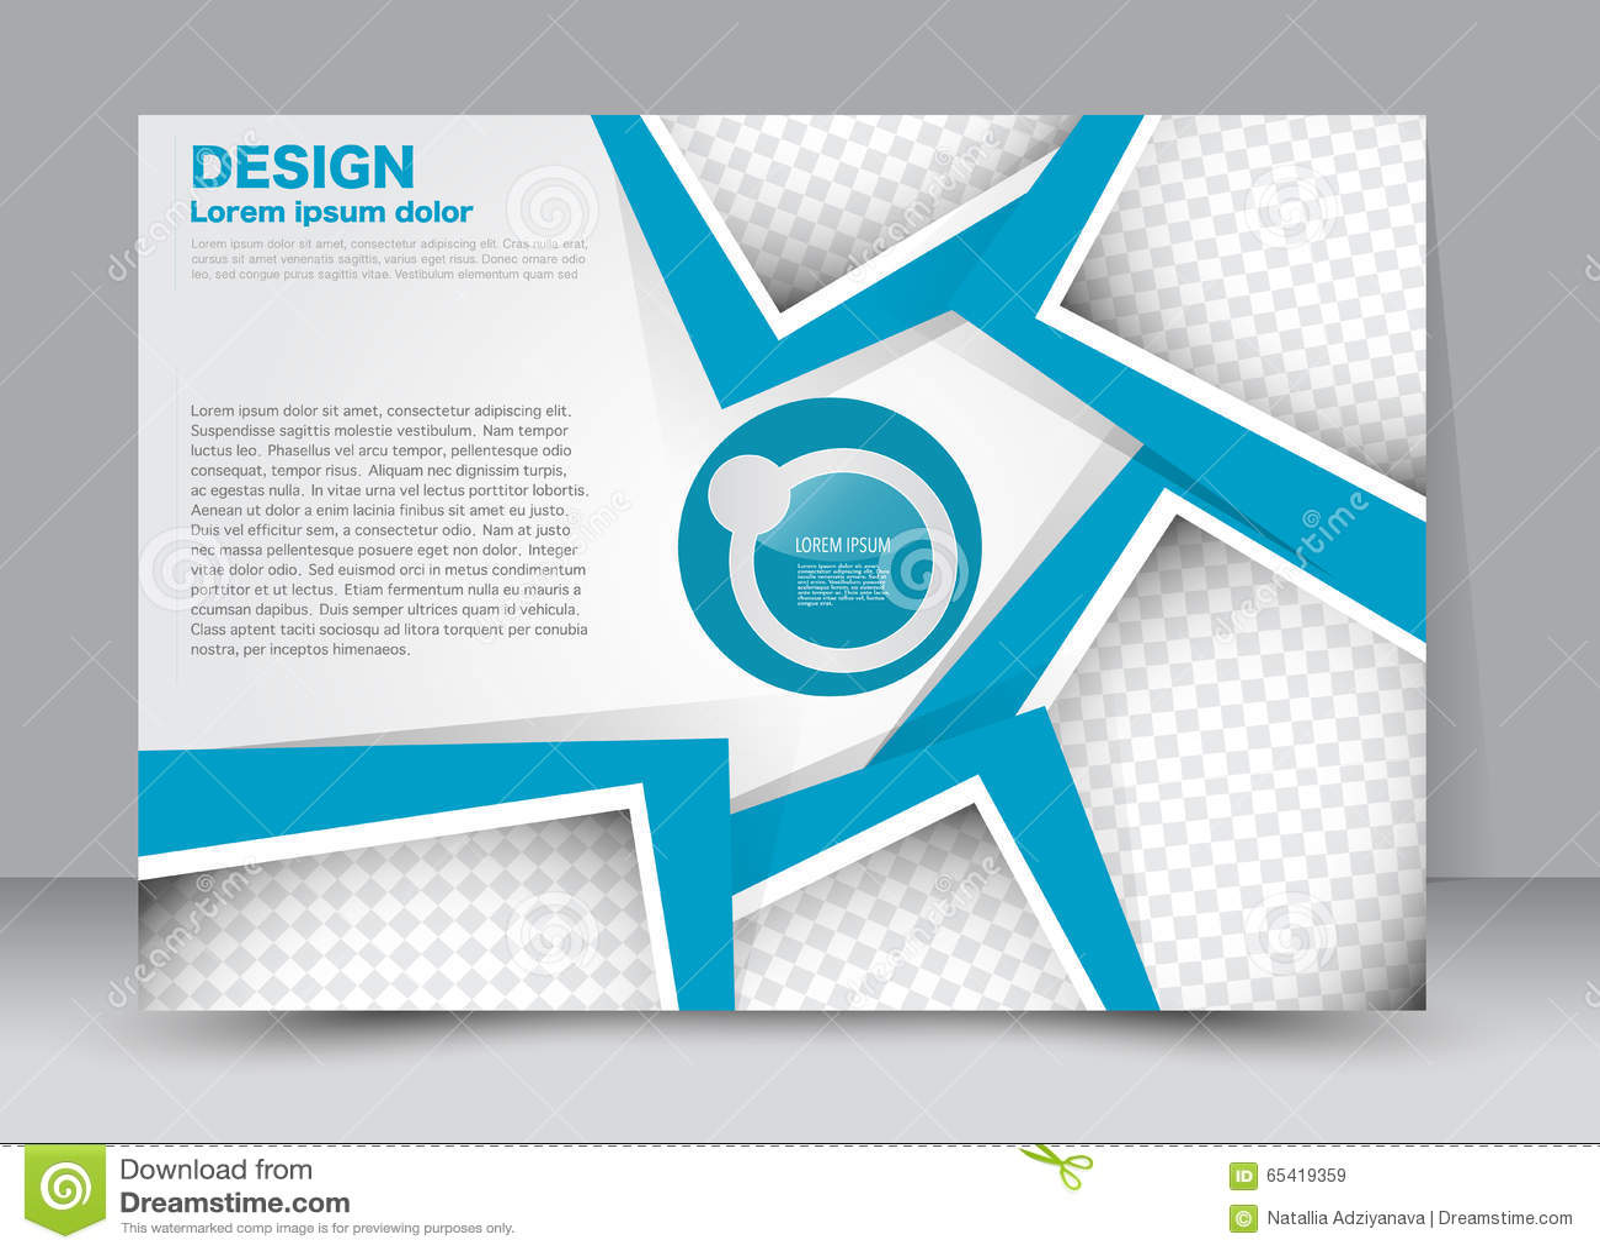 Landscape Book Cover Design : Flyer brochure magazine cover template design landscape